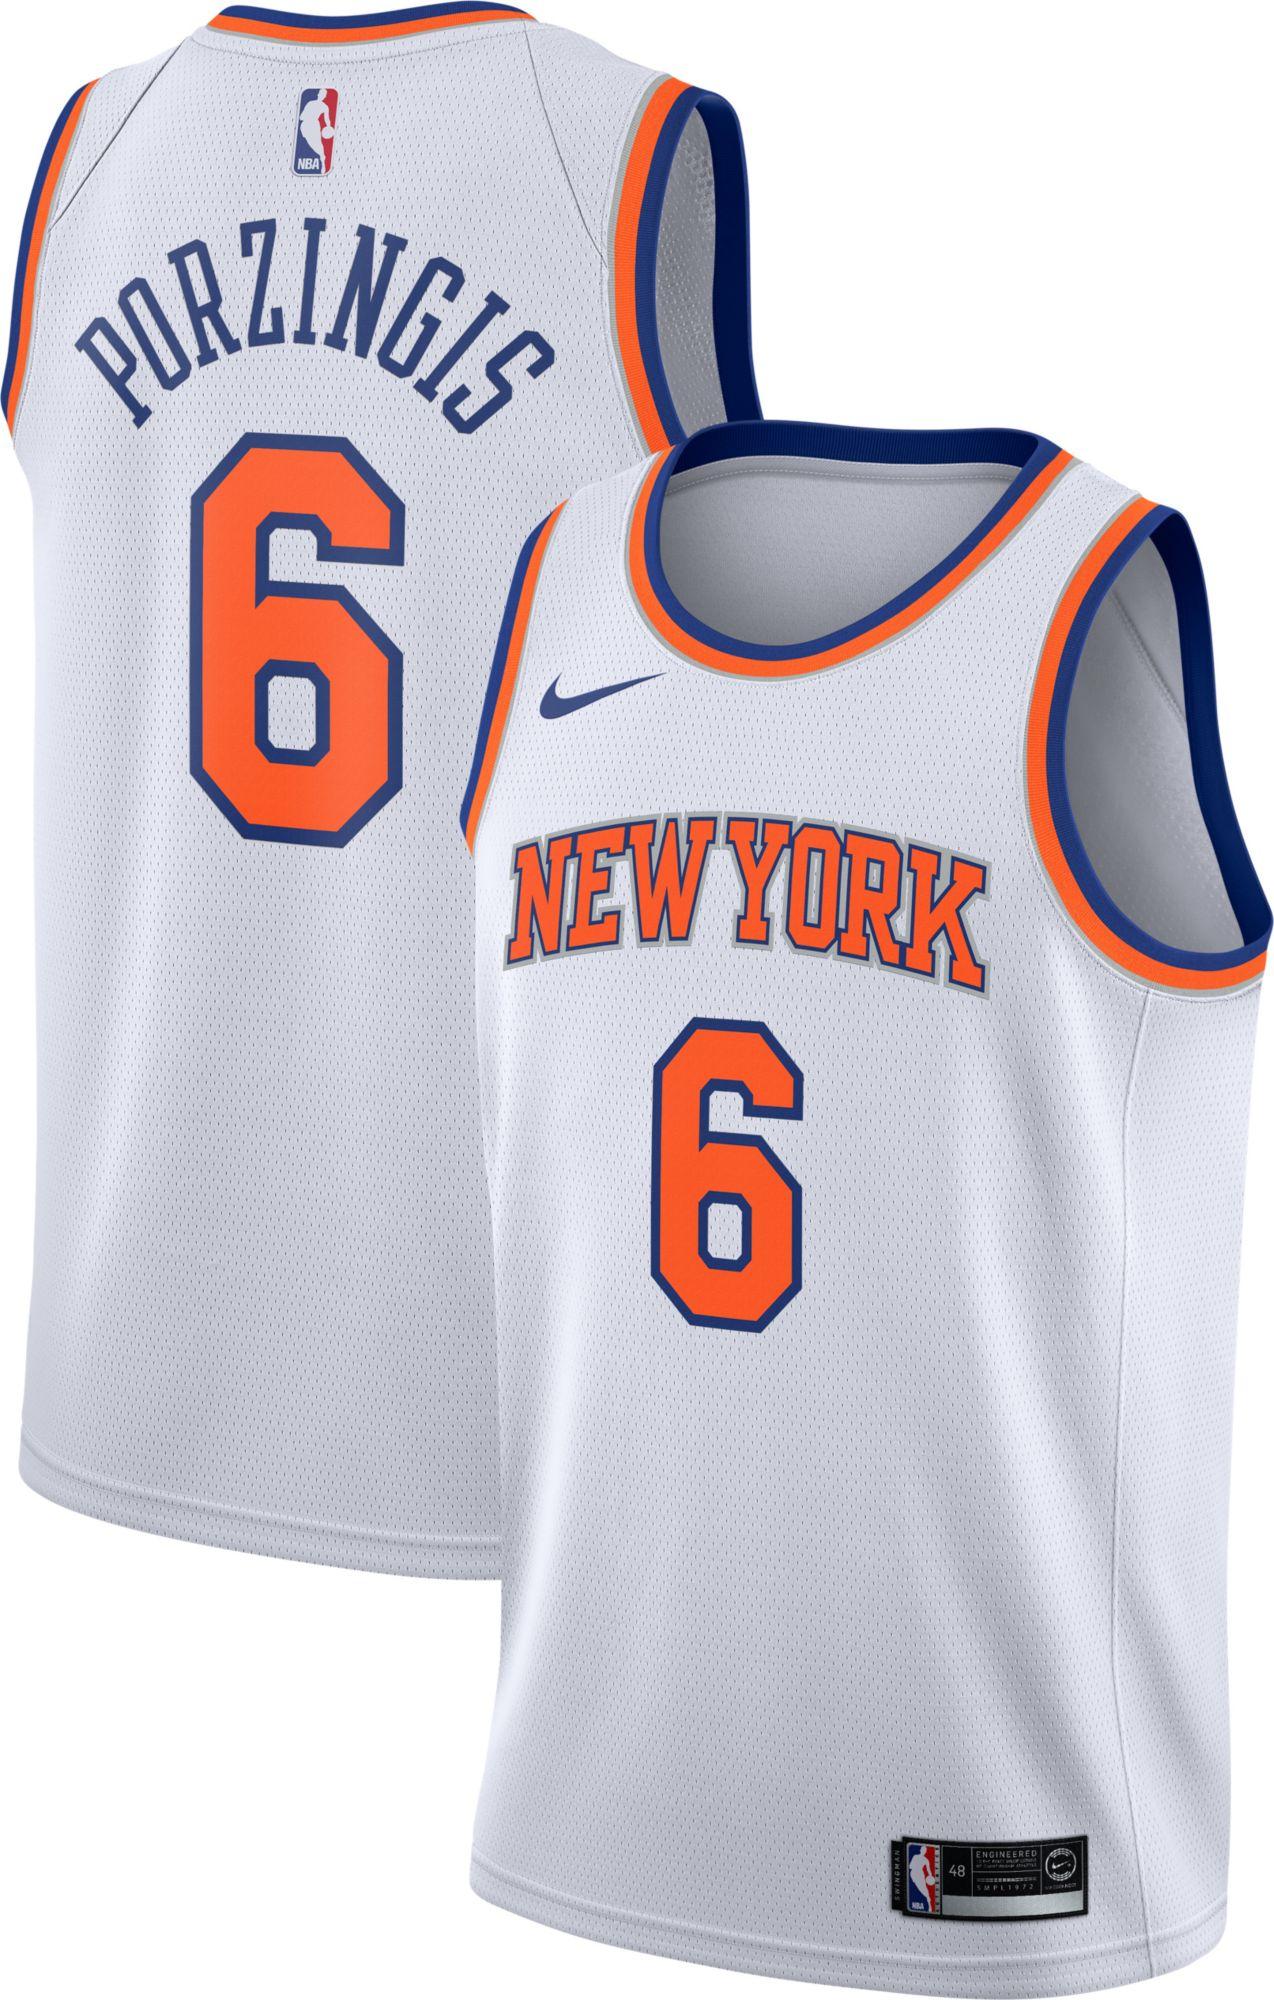 666c7f54806 Nike Men s New York Knicks Kristaps Porzingis  6 White Dri-FIT Swingman  Jersey